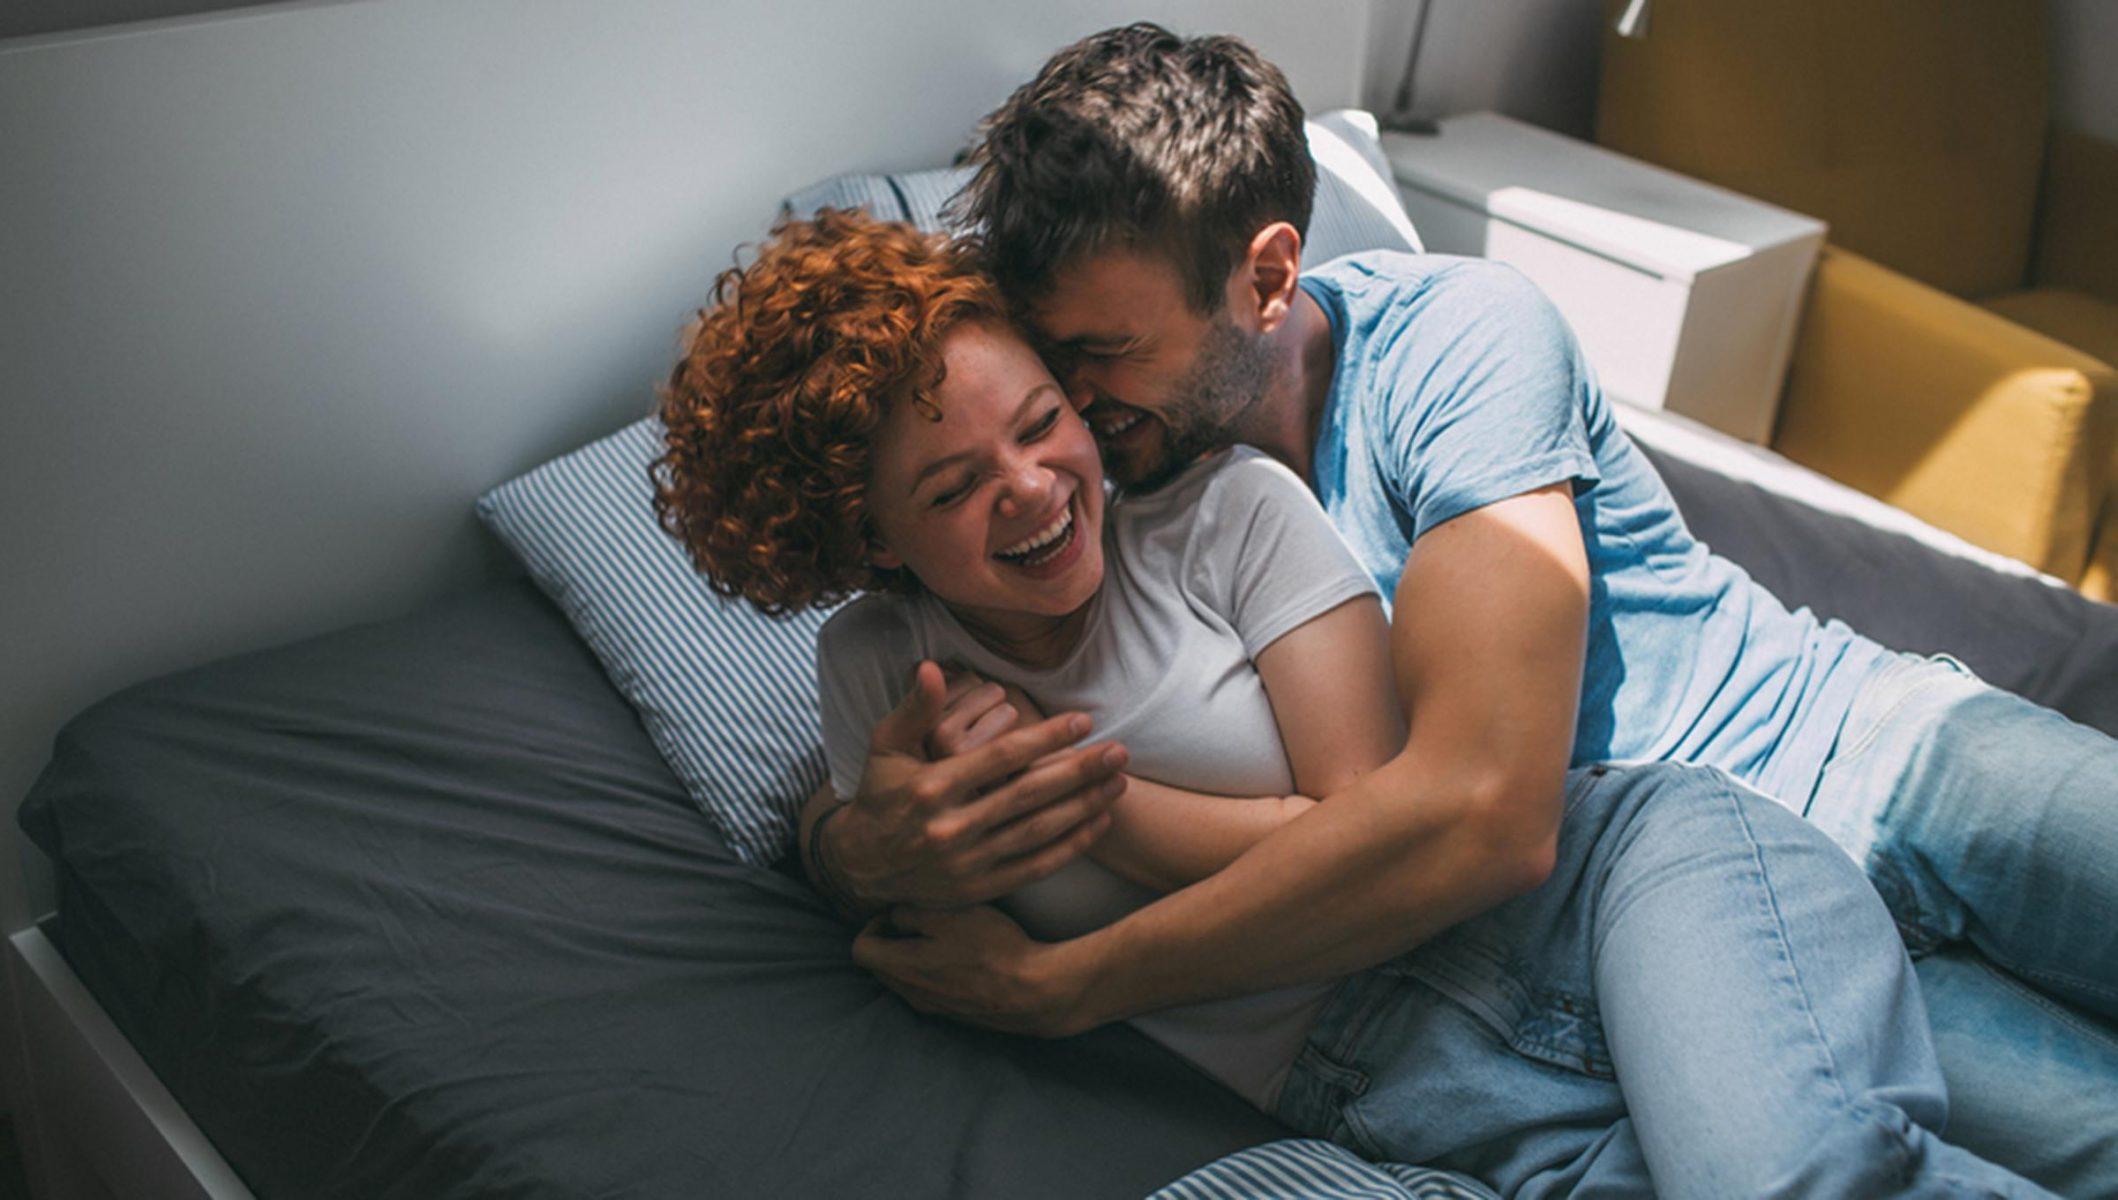 Sadhguru: Είναι φυσιολογικό να σκέφτεσαι συνέχεια το σεξ [pic,vid]